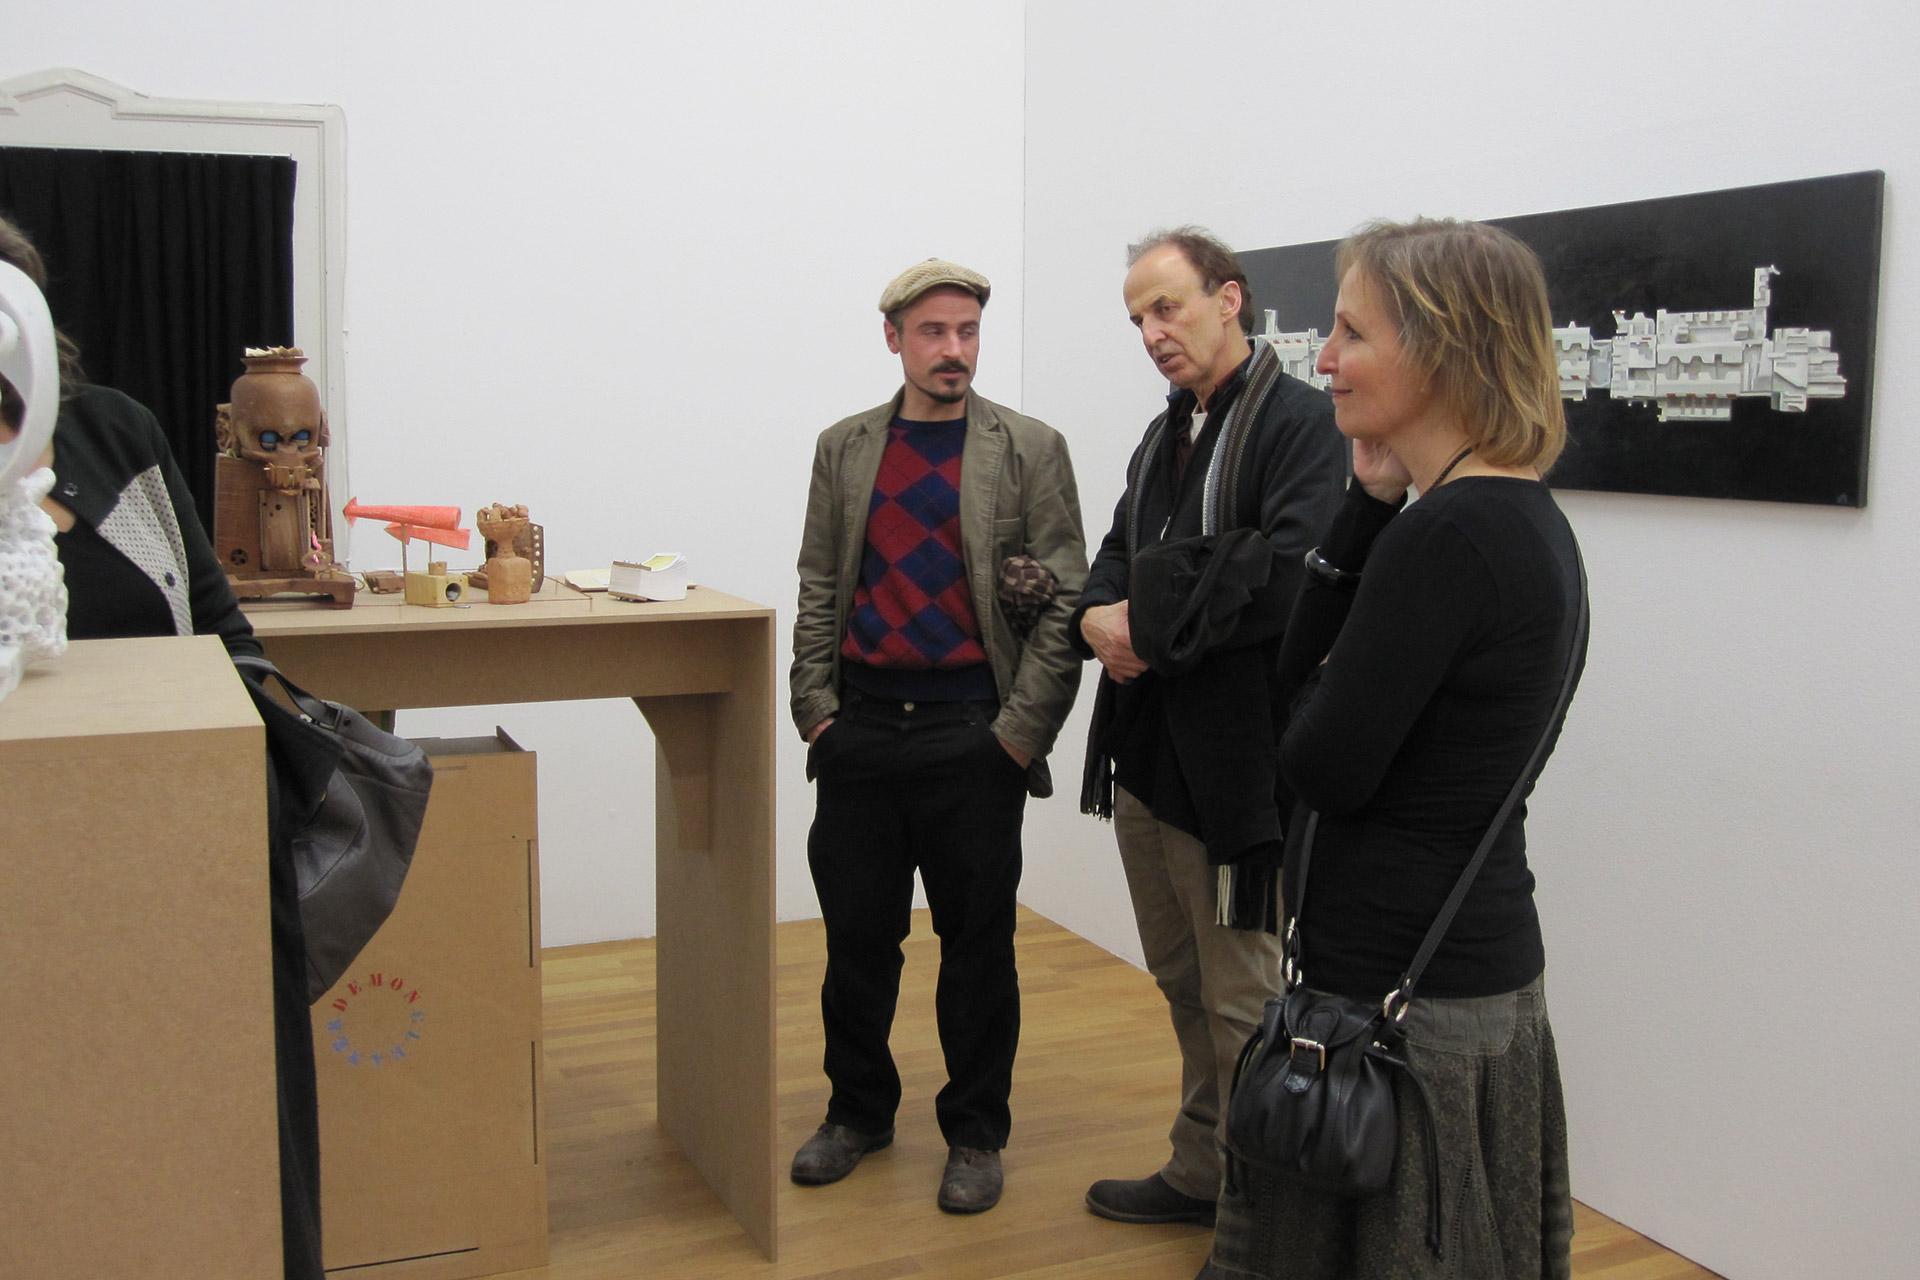 Dezember-Ausstellung-Kunsthalle-Winterthur-2011-2.jpg